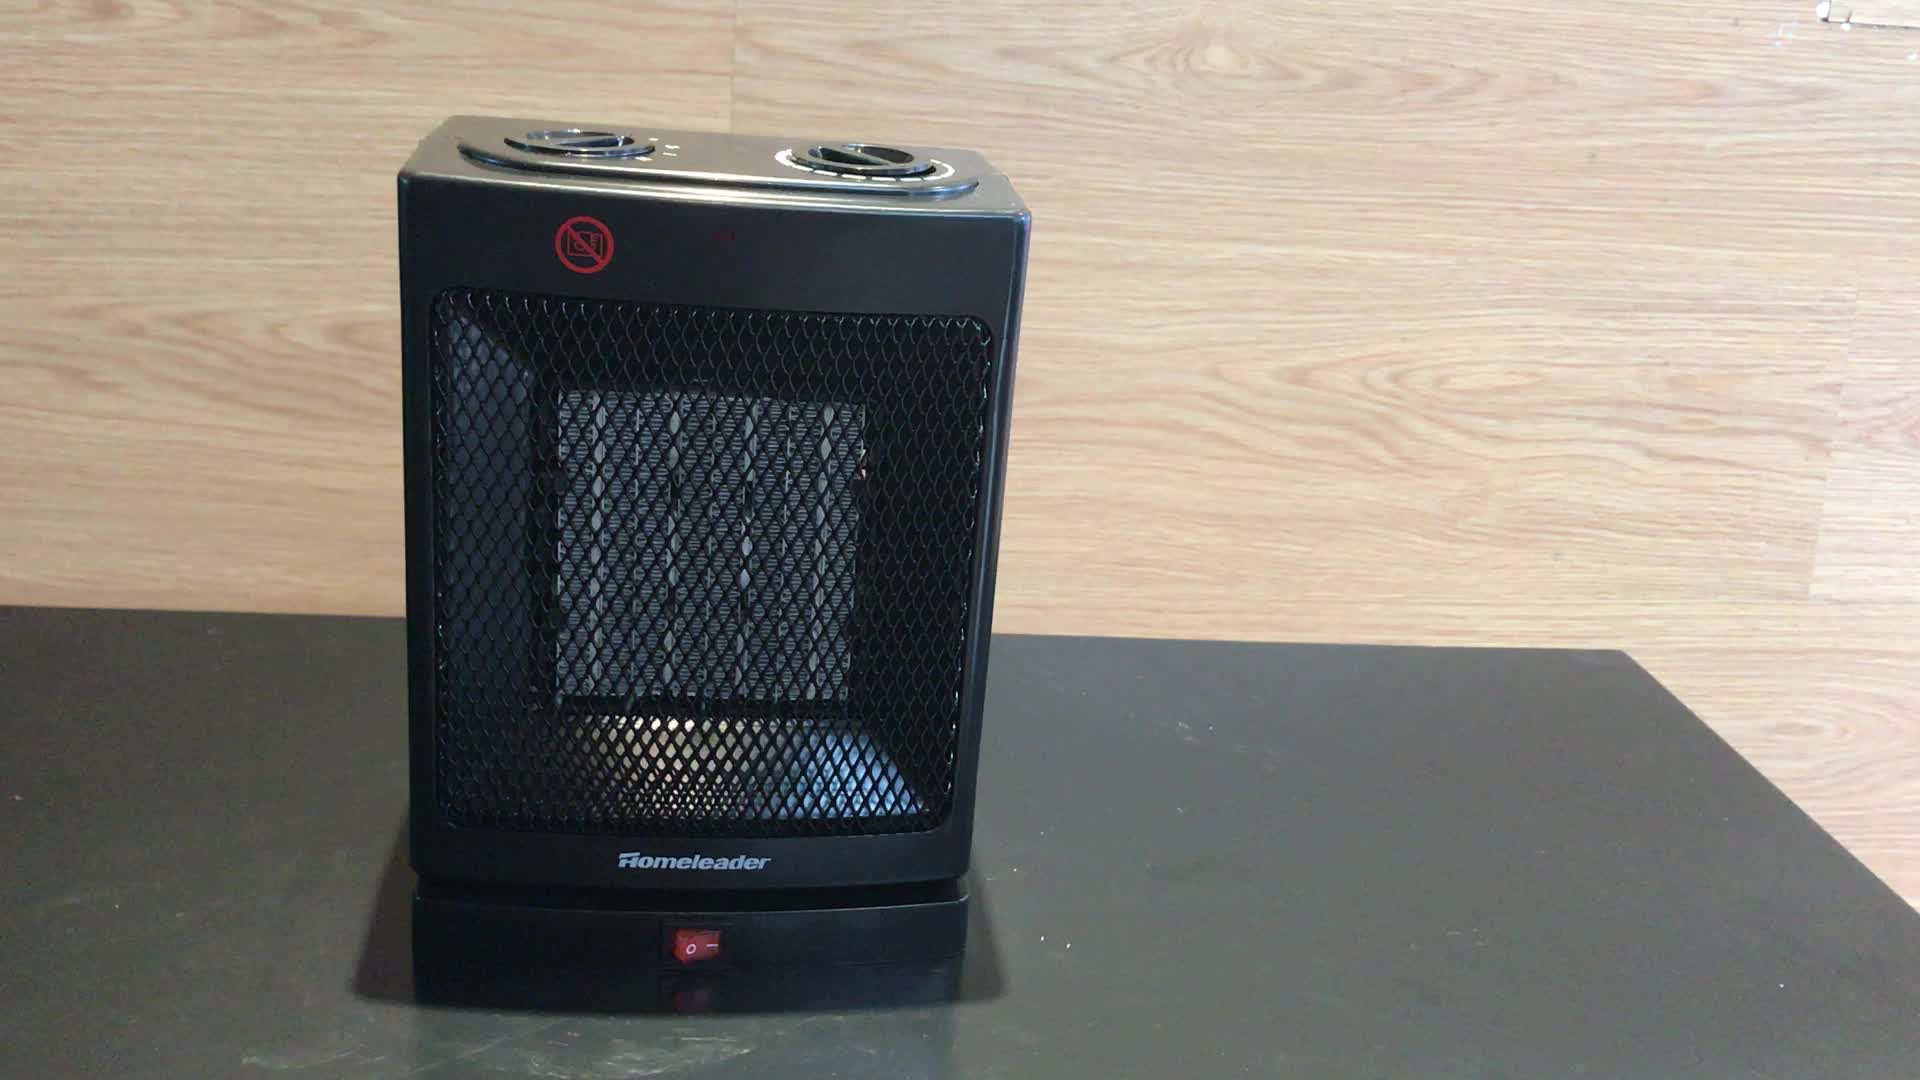 Hot Sale Oscillating Base Electric Table Fan Heater Buy